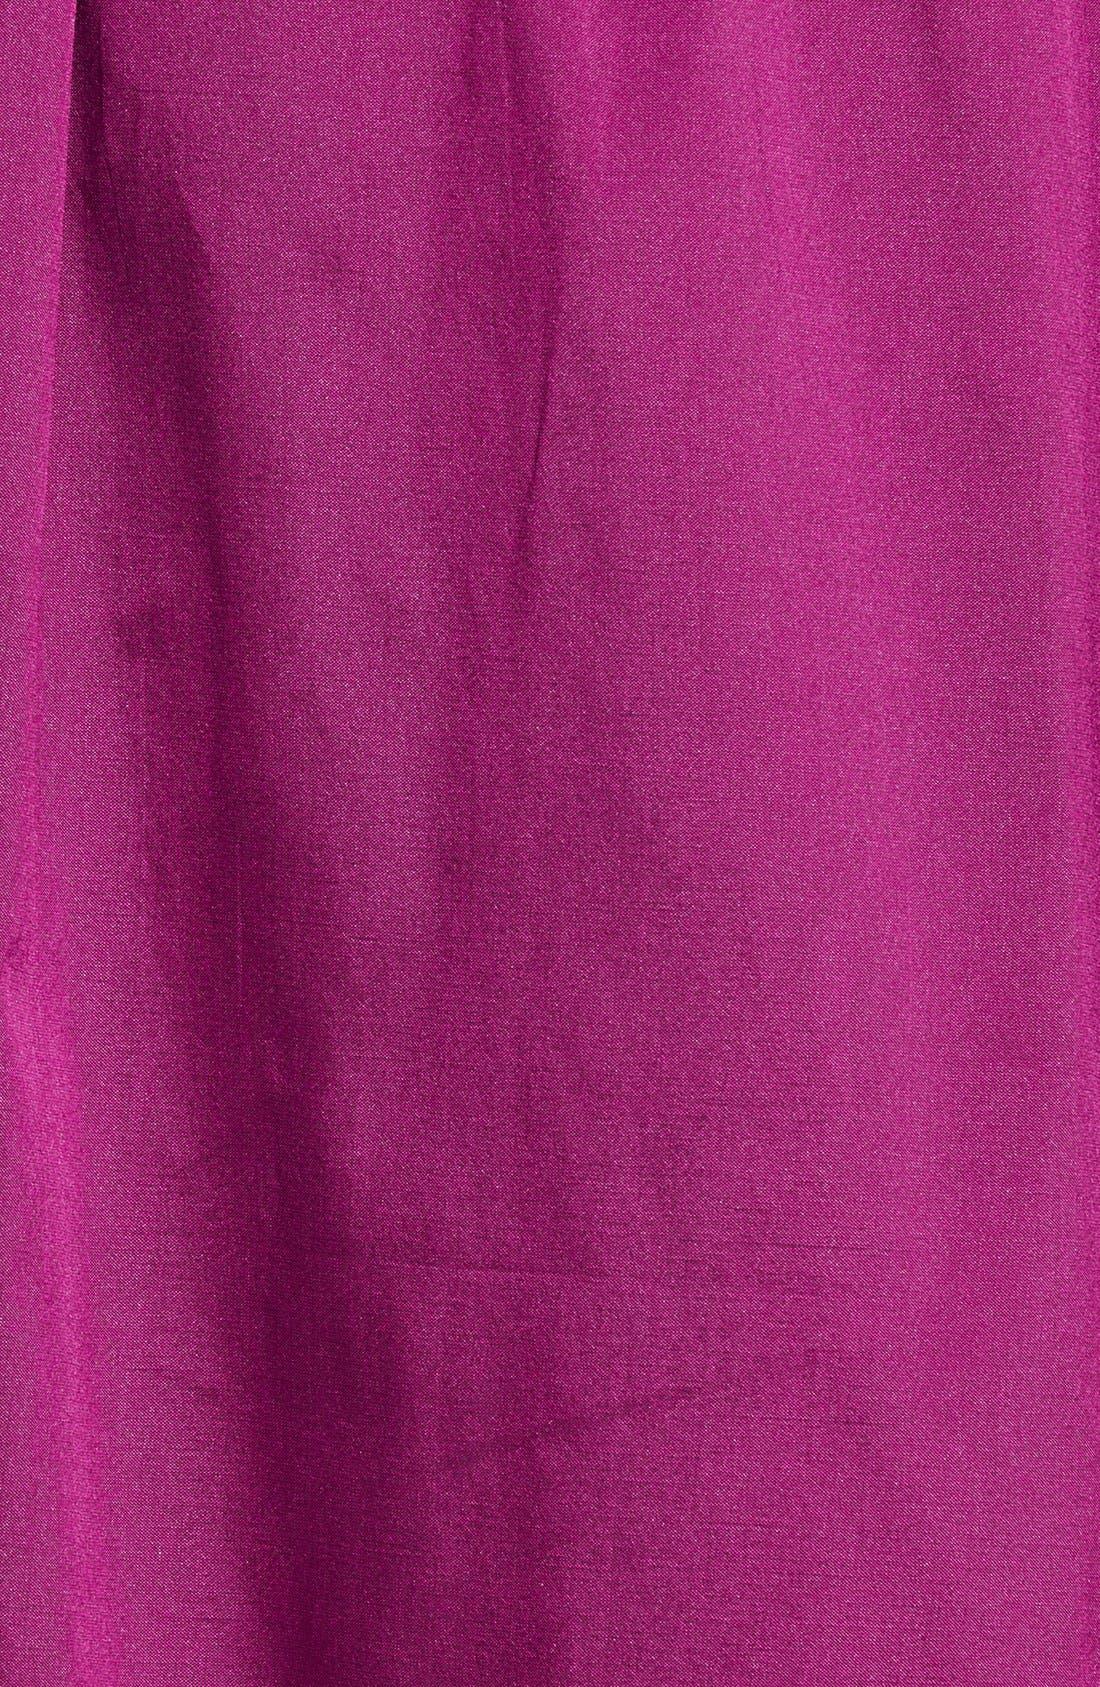 Sleeveless Taffeta & Tulle Gown,                             Alternate thumbnail 2, color,                             650